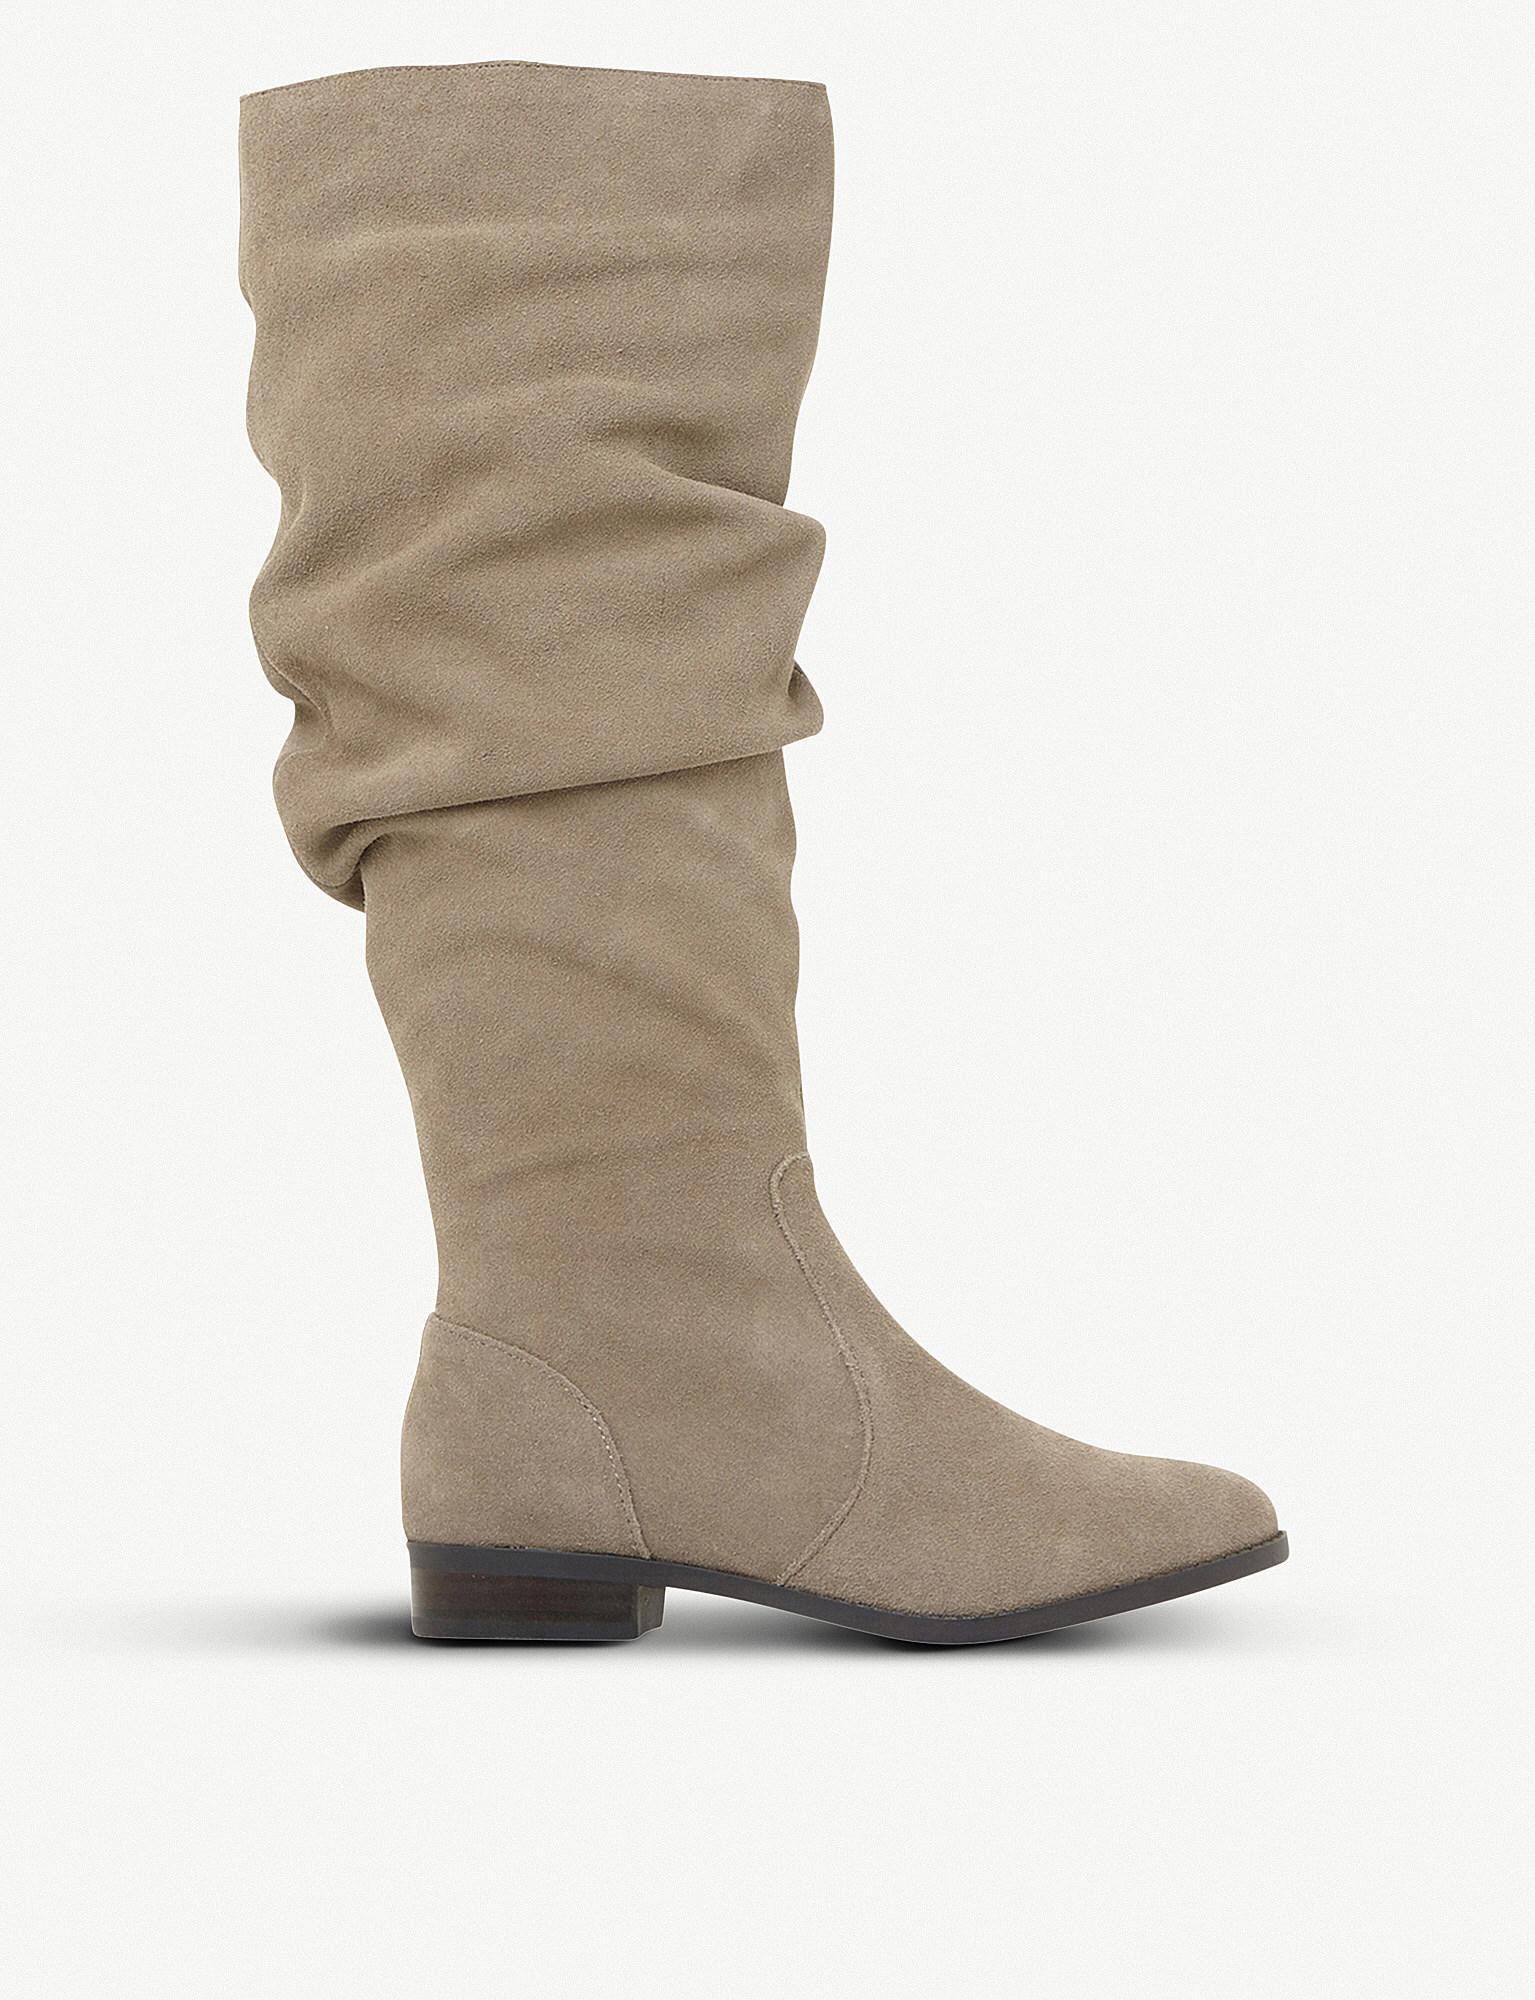 1c540fdb0fb Steve Madden. Women s Beacon Sm Suede Boots